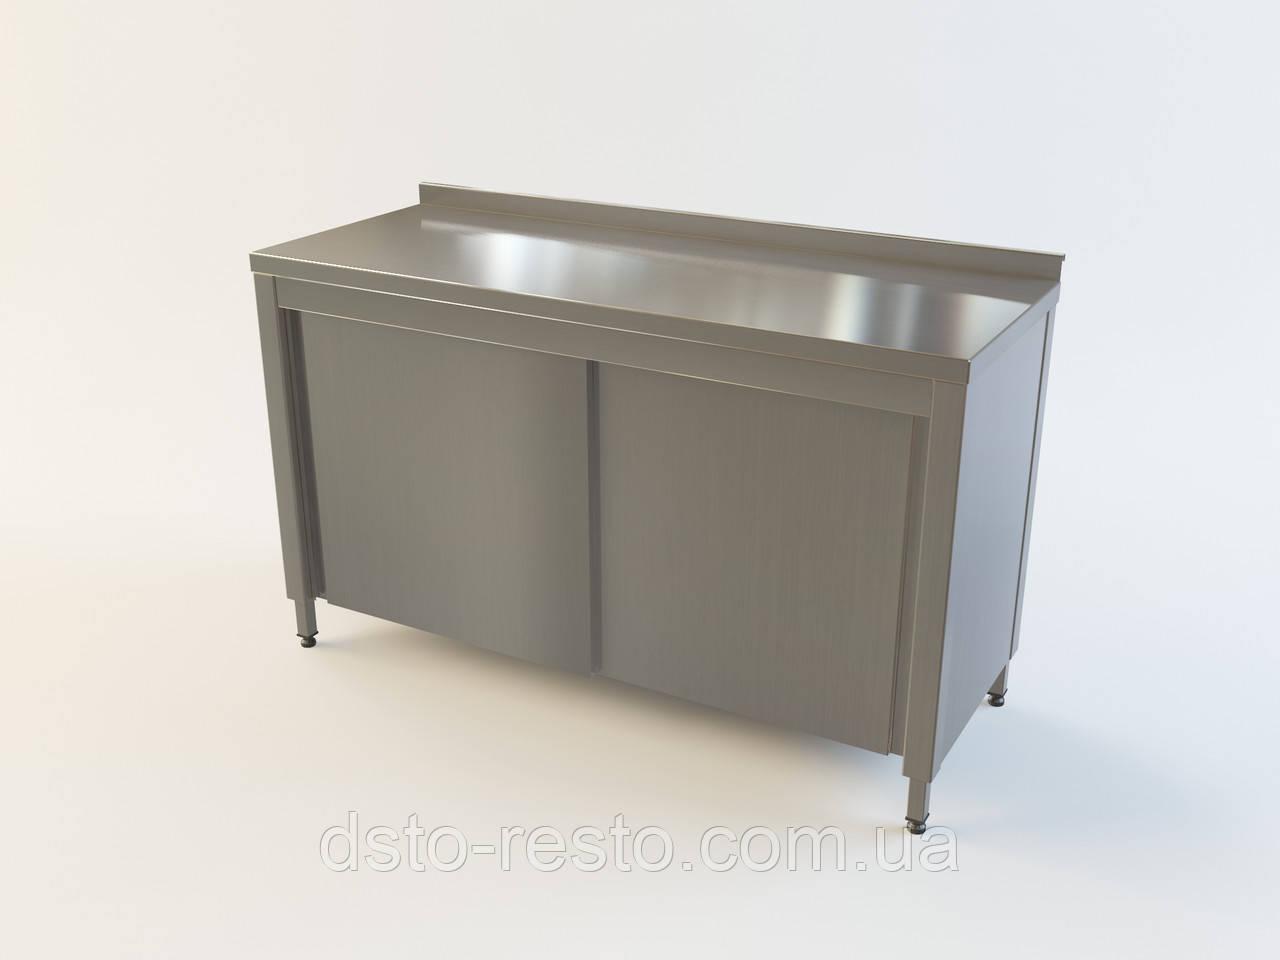 Стол тепловой 1500/700/850 мм